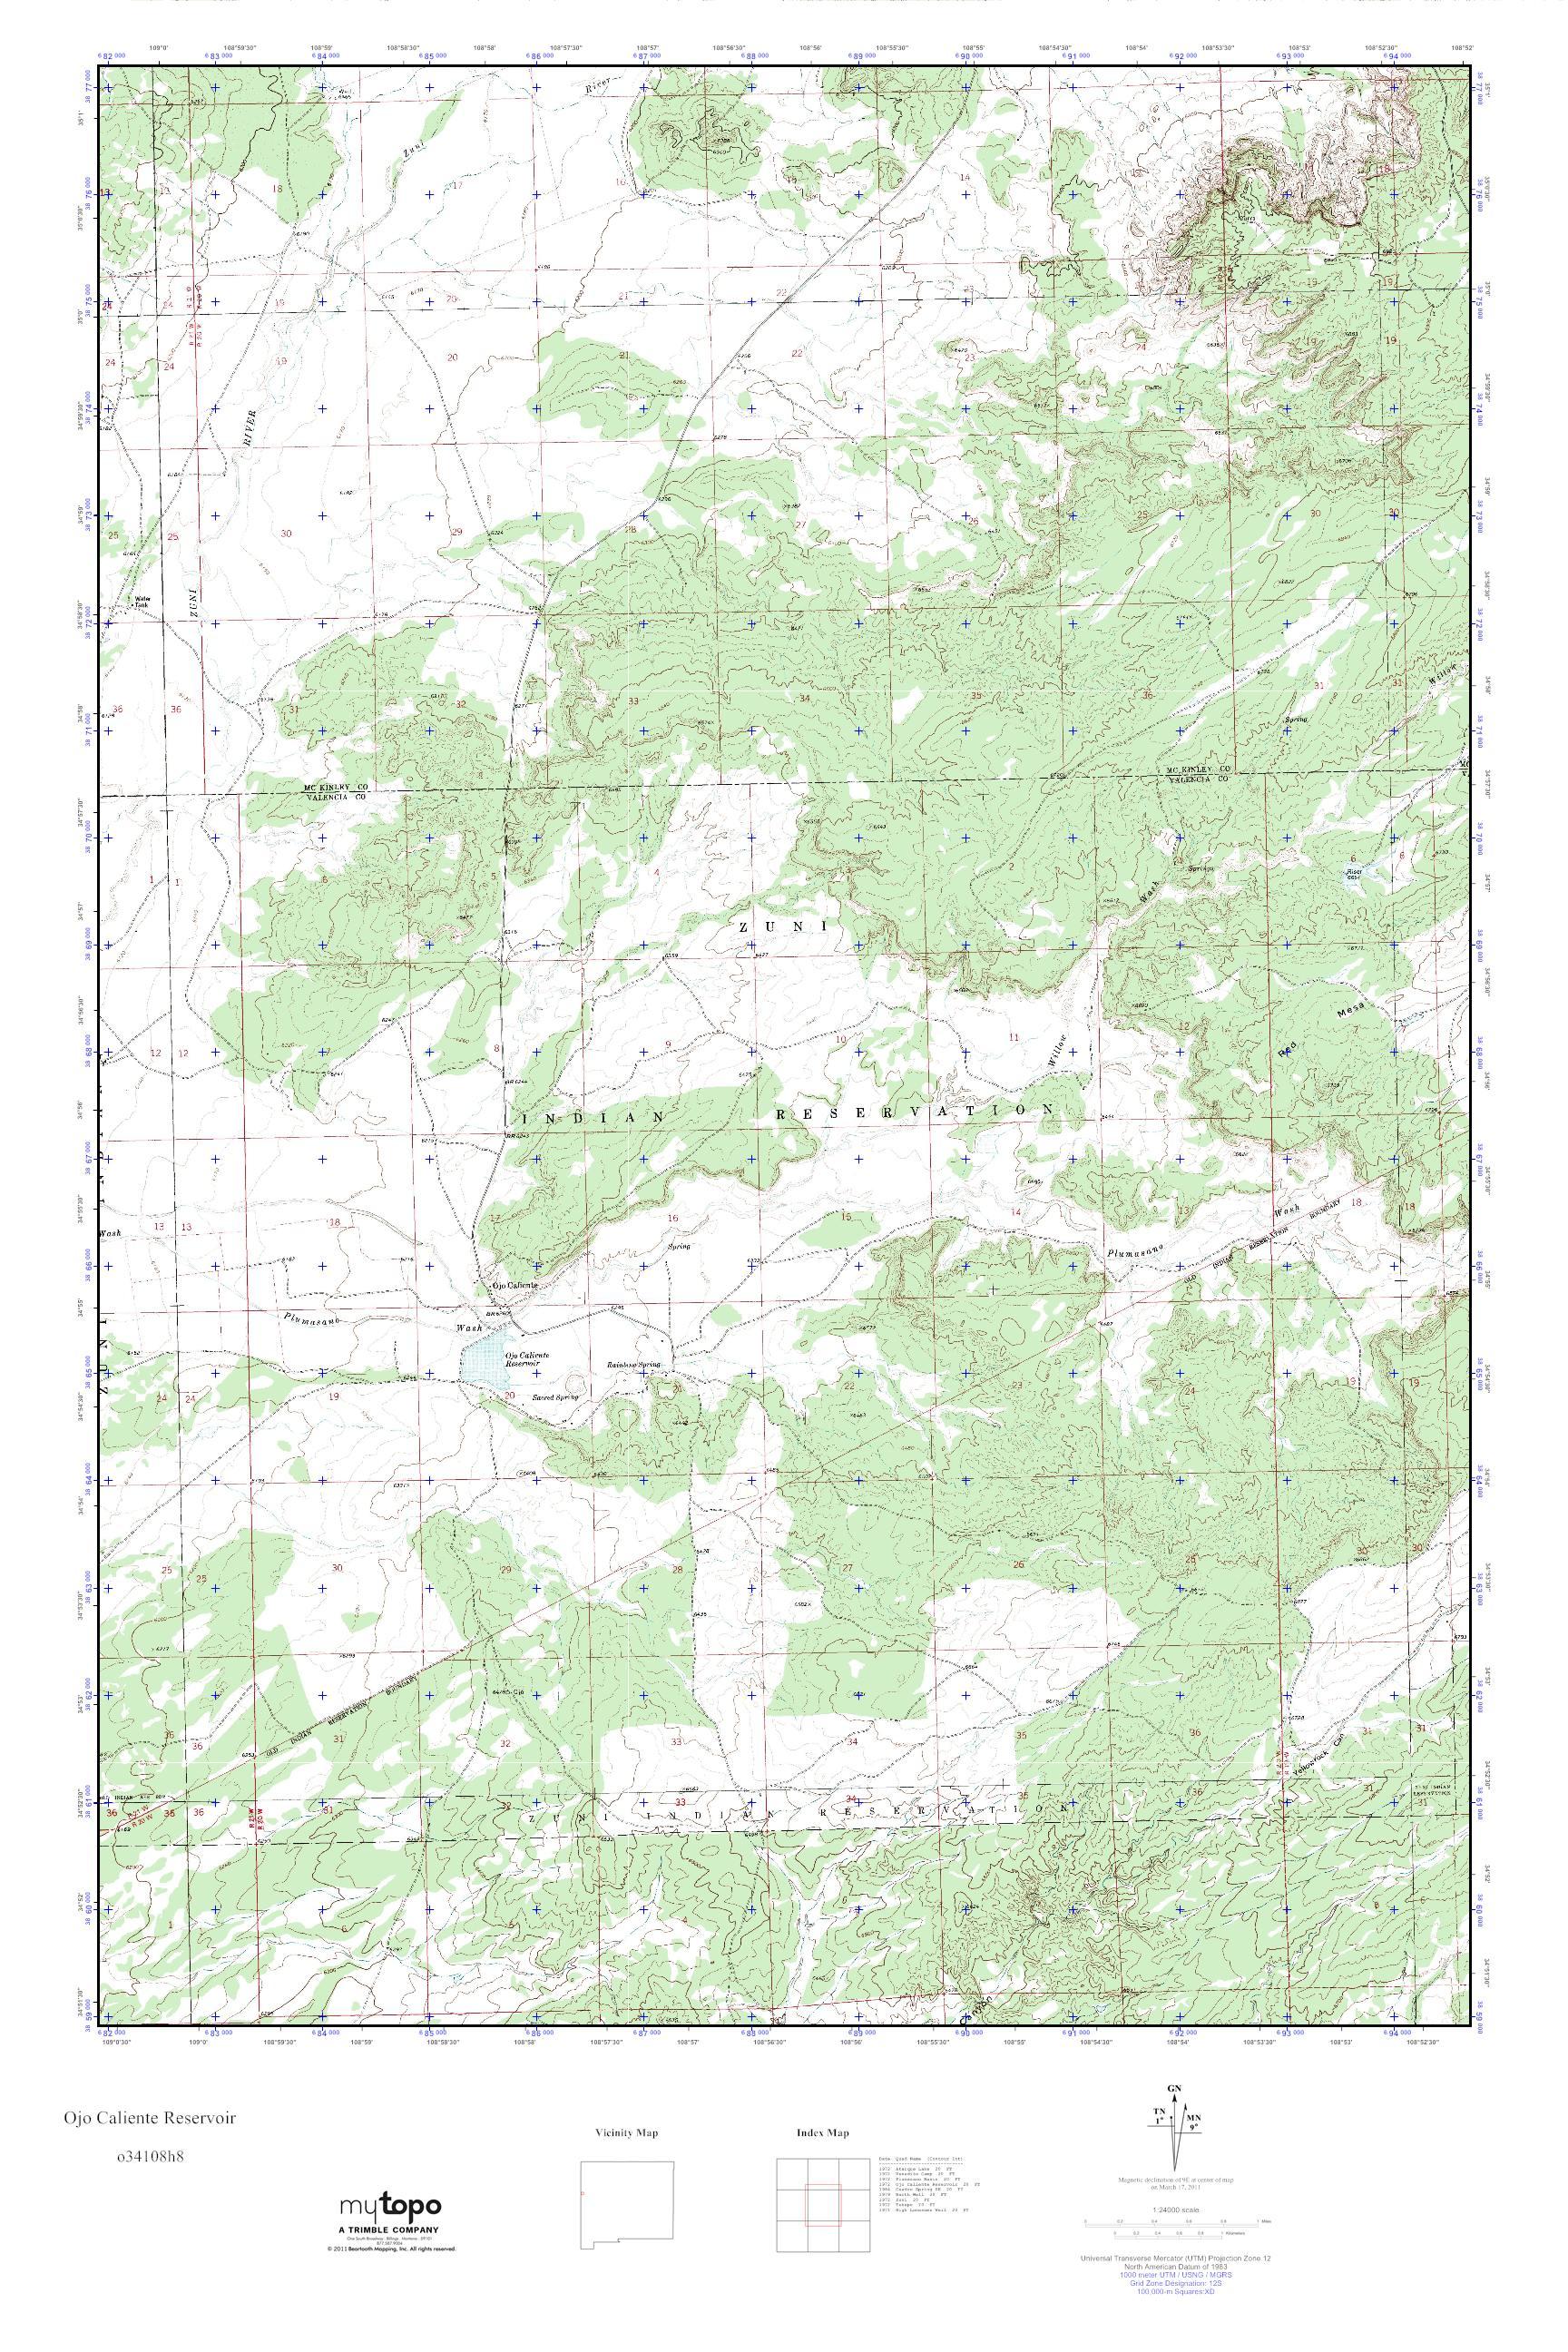 Ojo Caliente New Mexico Map.Mytopo Ojo Caliente Reservoir New Mexico Usgs Quad Topo Map